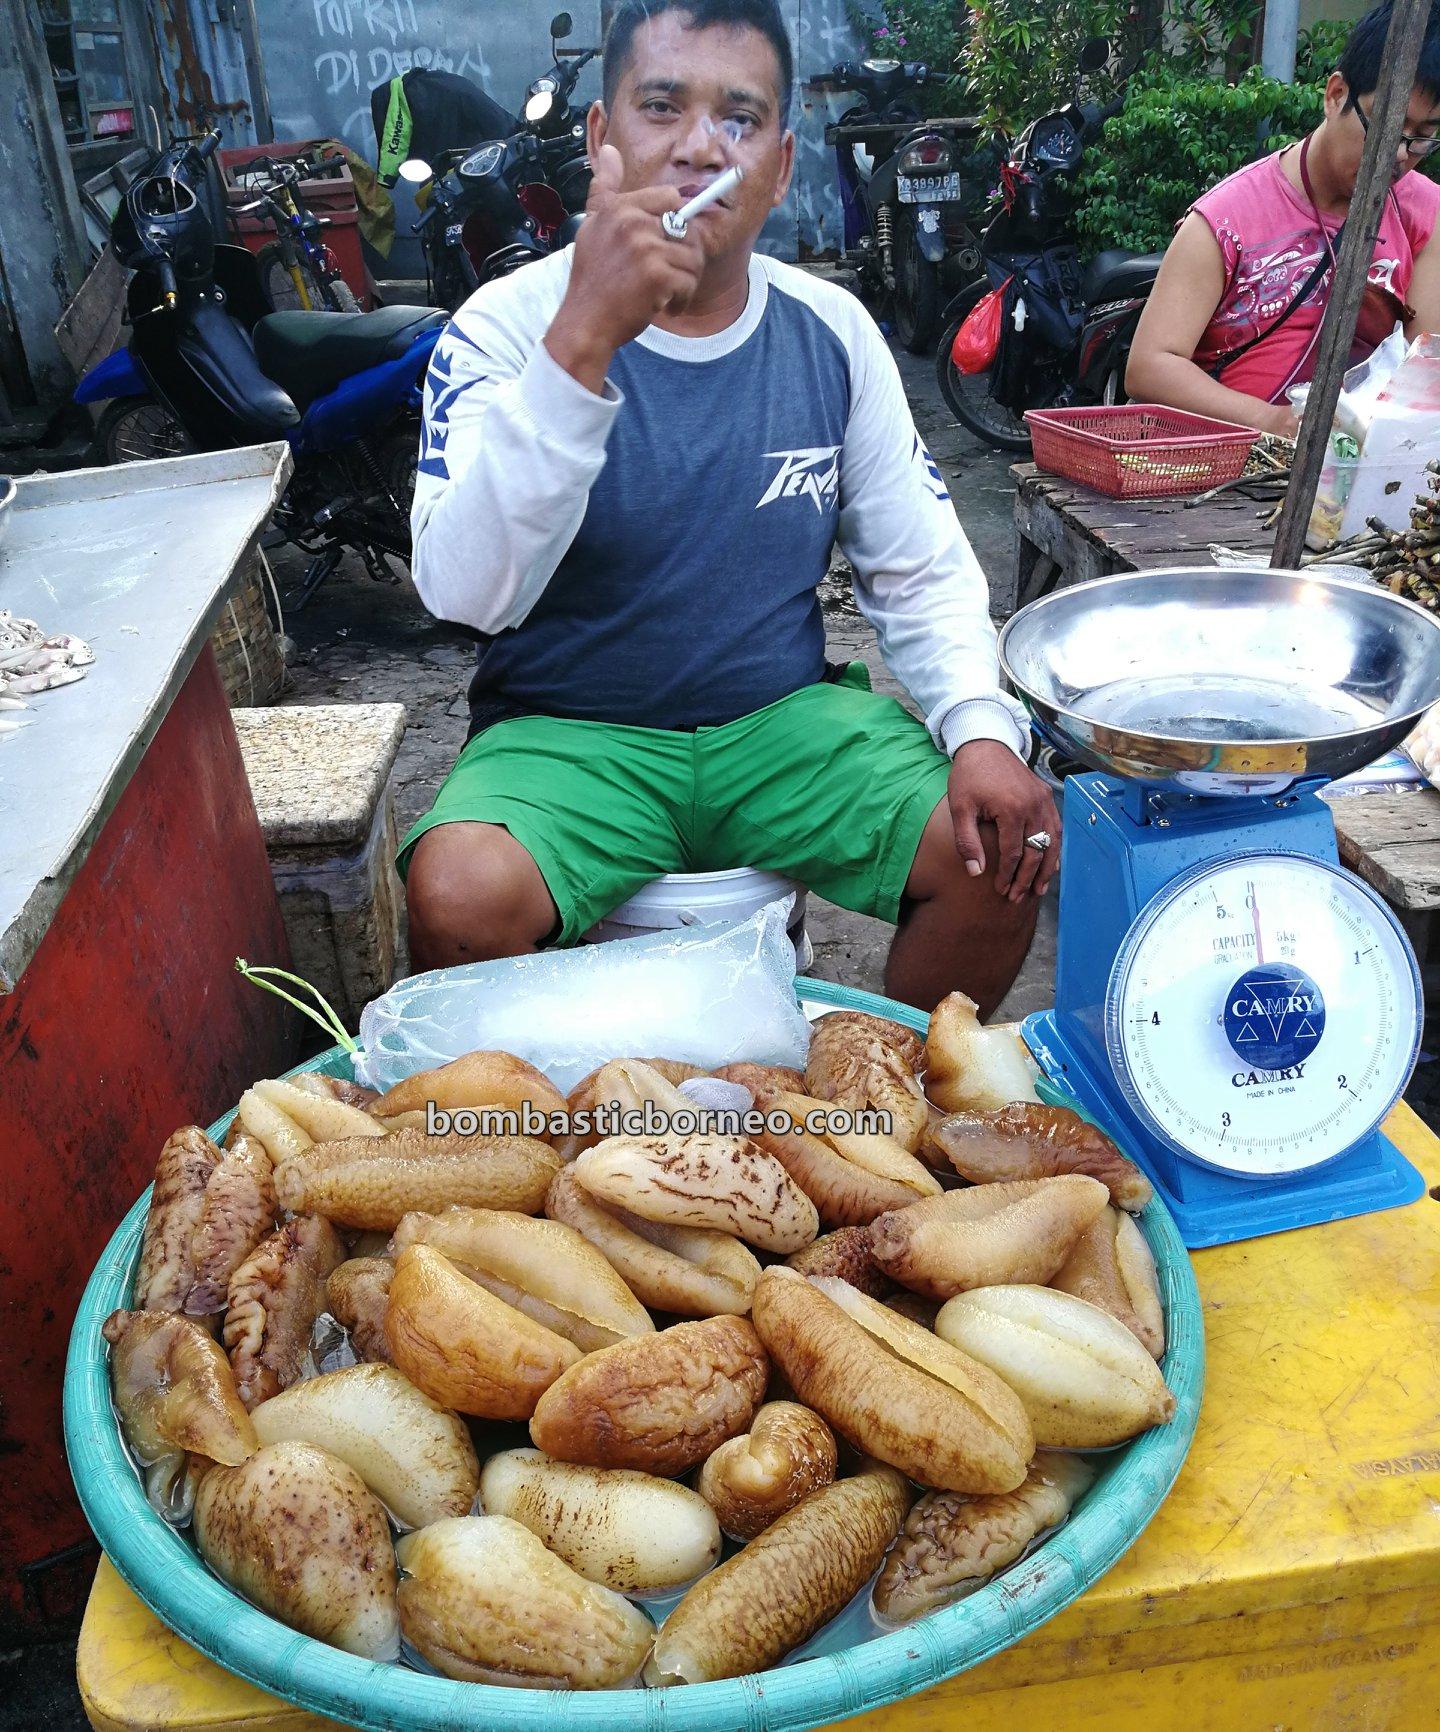 Local Market, authentic, traditional, destination, Kalimantan Barat, seafood, sea cucumber, Obyek wisata, Tourist attraction, travel guide, Trans Borneo, 探索婆罗洲游踪, 印尼西加里曼丹, 山口洋海鲜早市